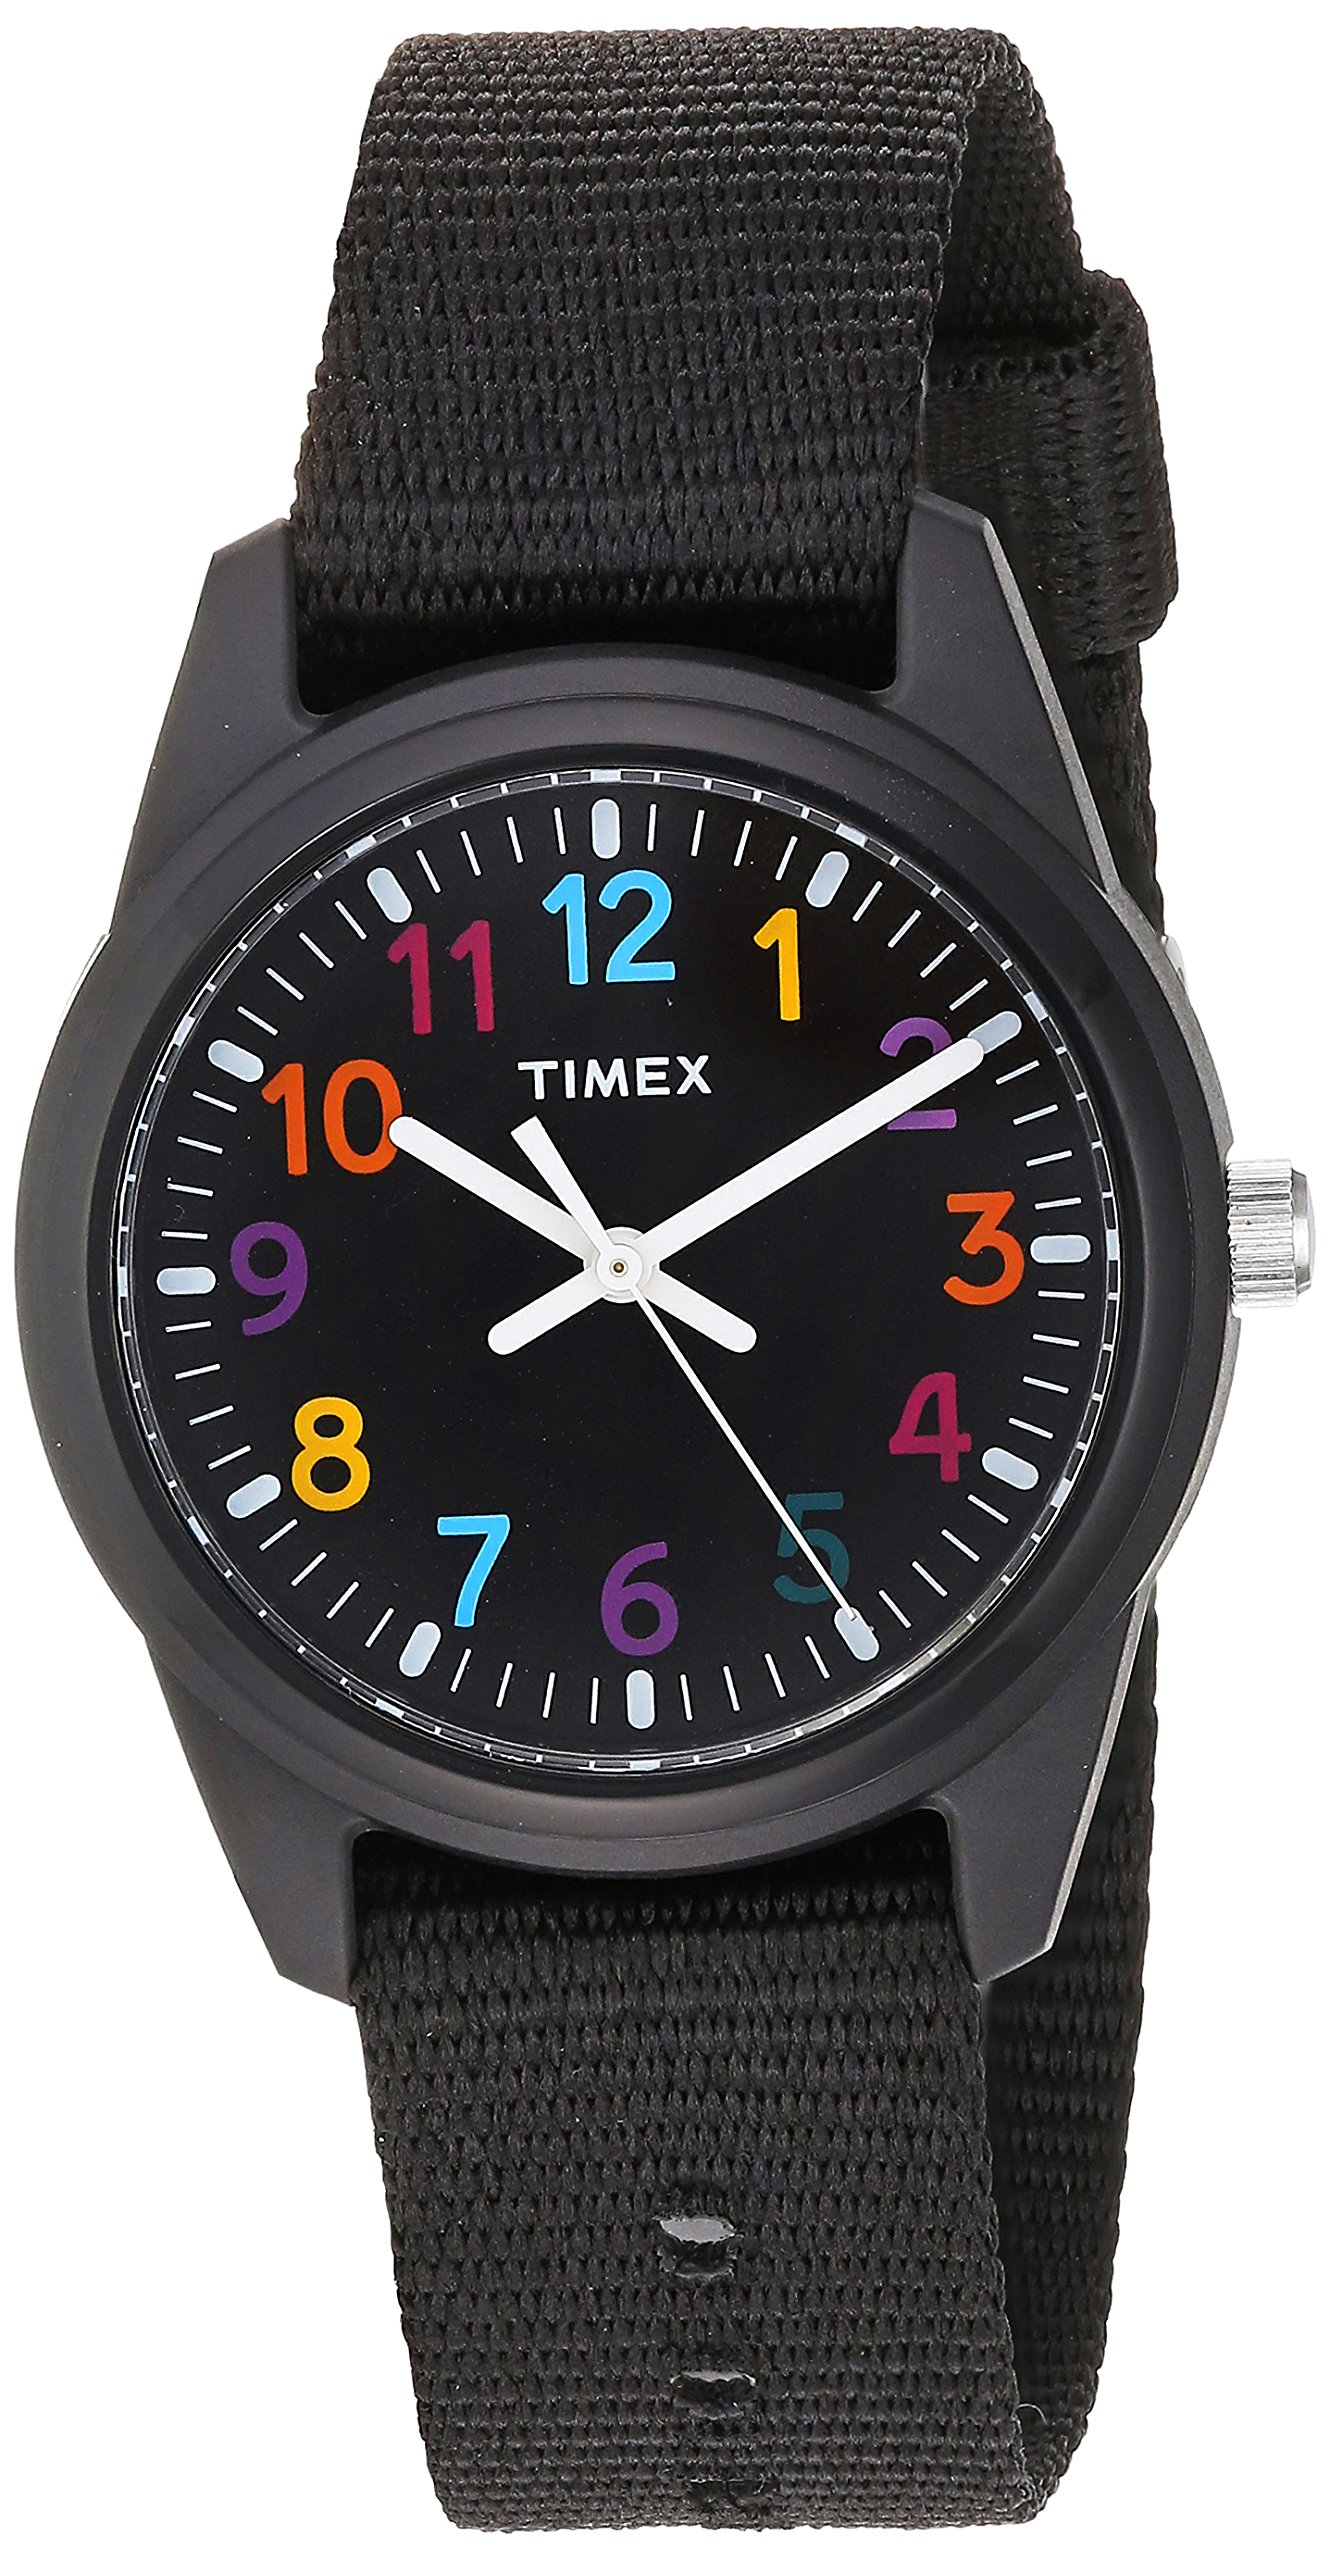 Timex Girls TW7C10400 Time Machines Black Nylon Strap Watch by Timex